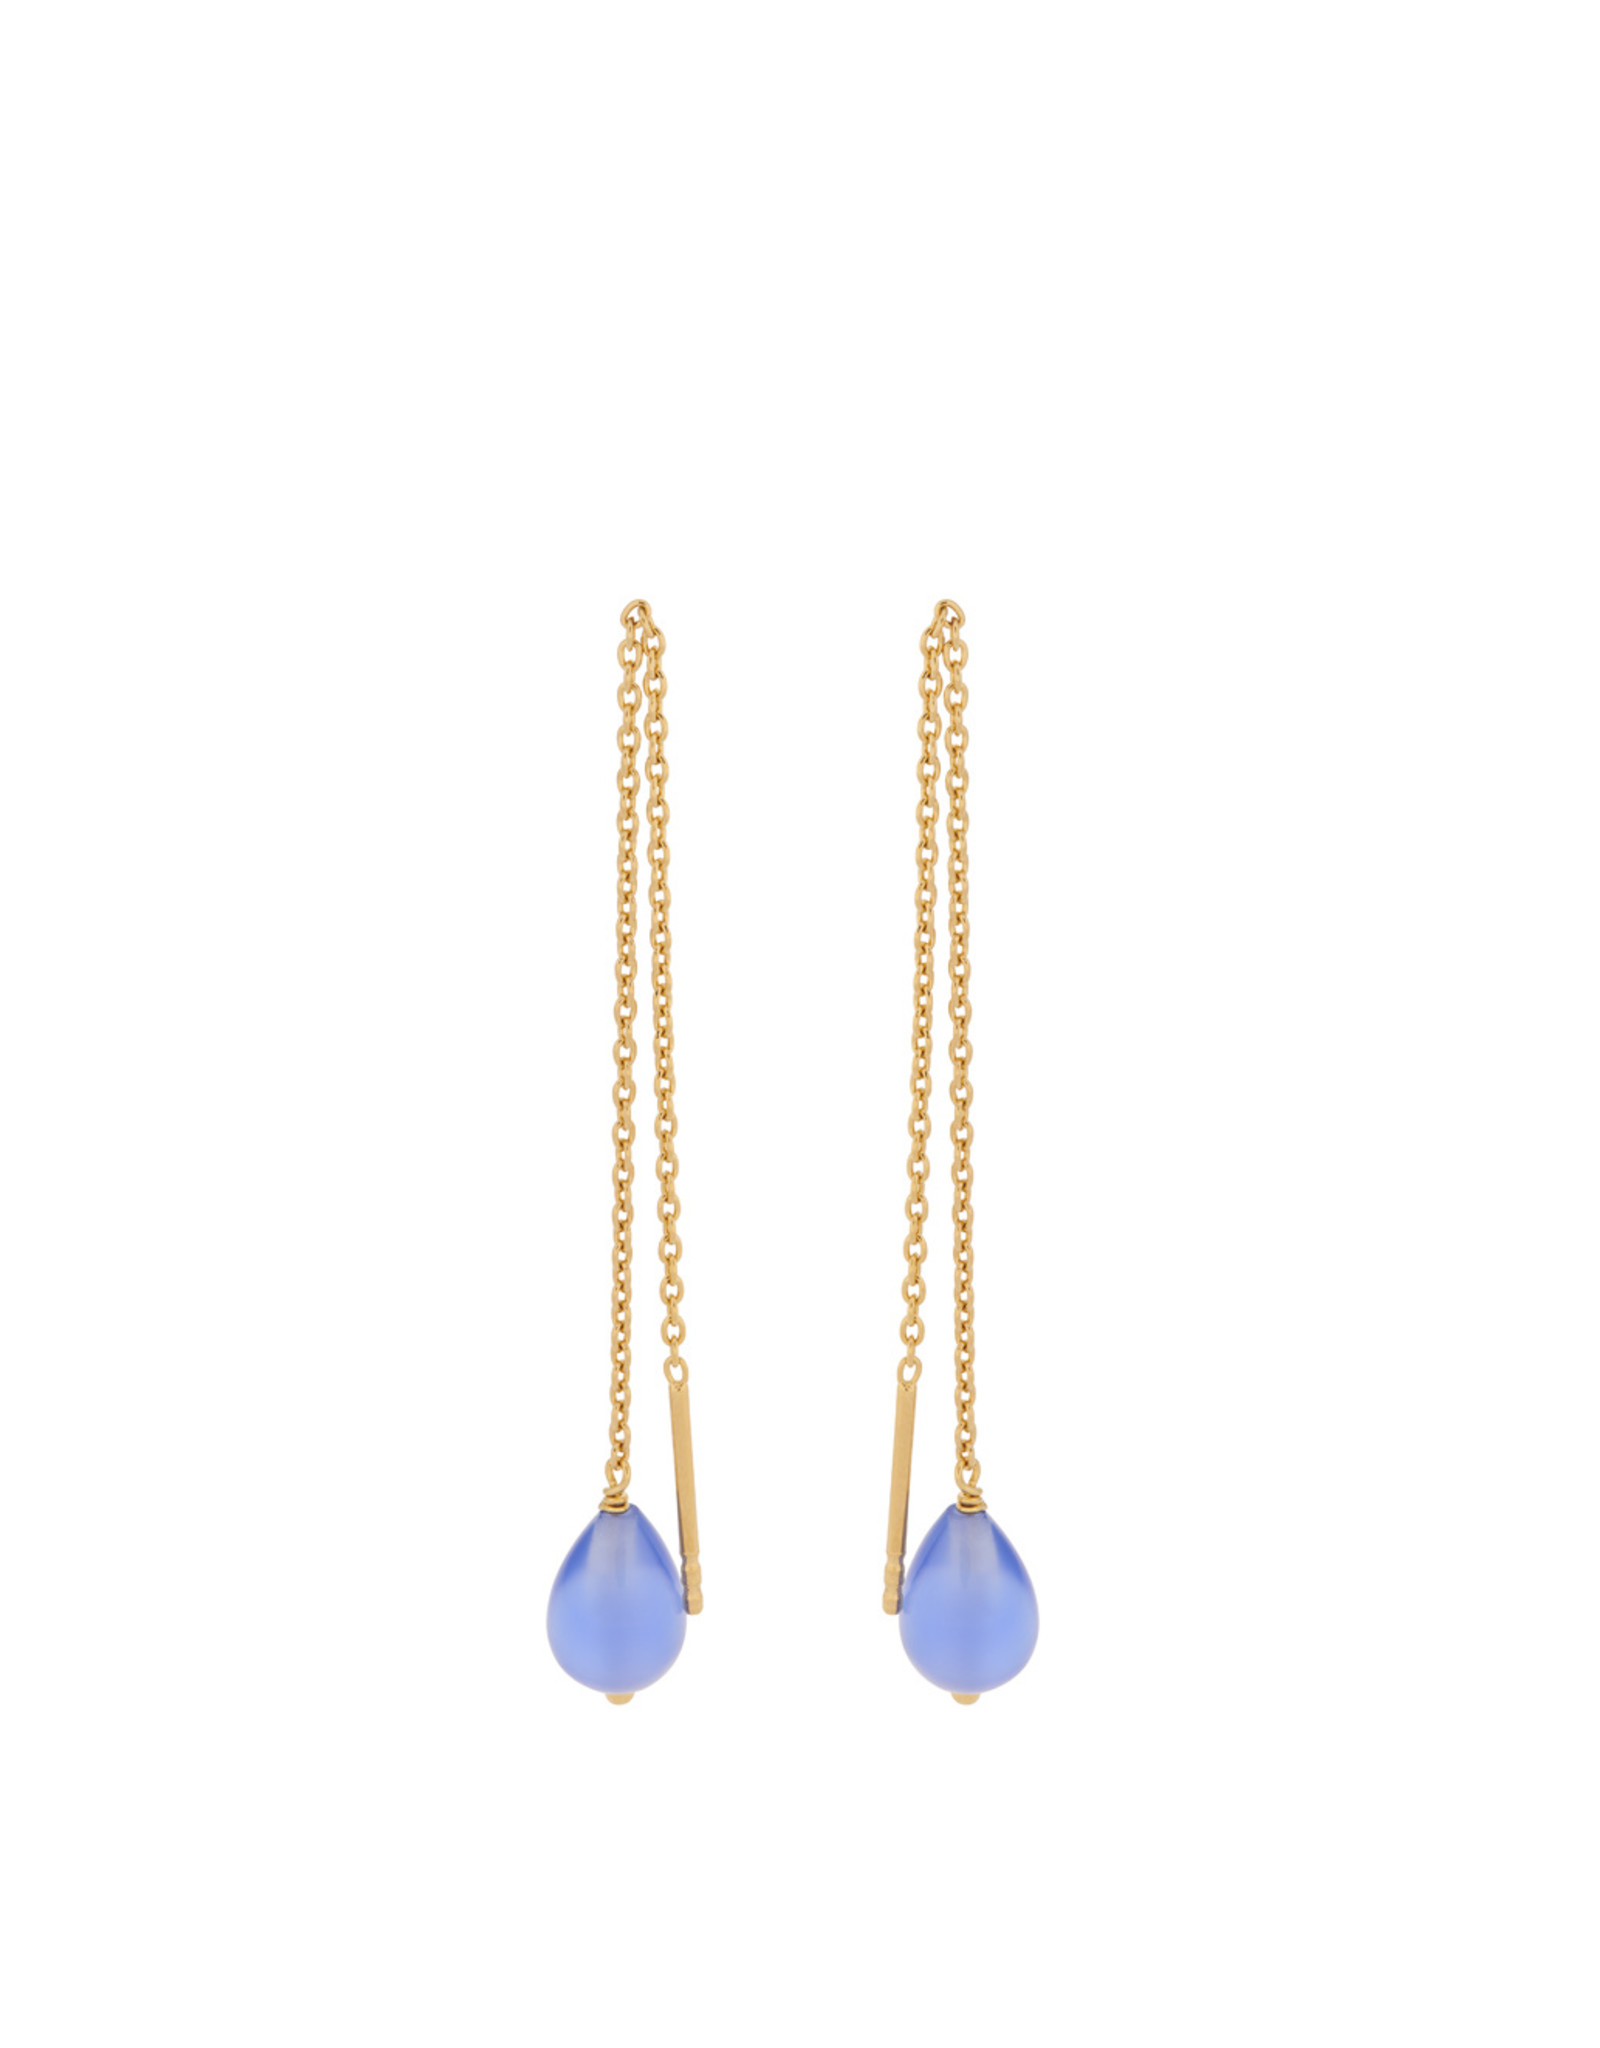 Pernille Corydon Aqua Blue Earchains 10cm, Blue Agate